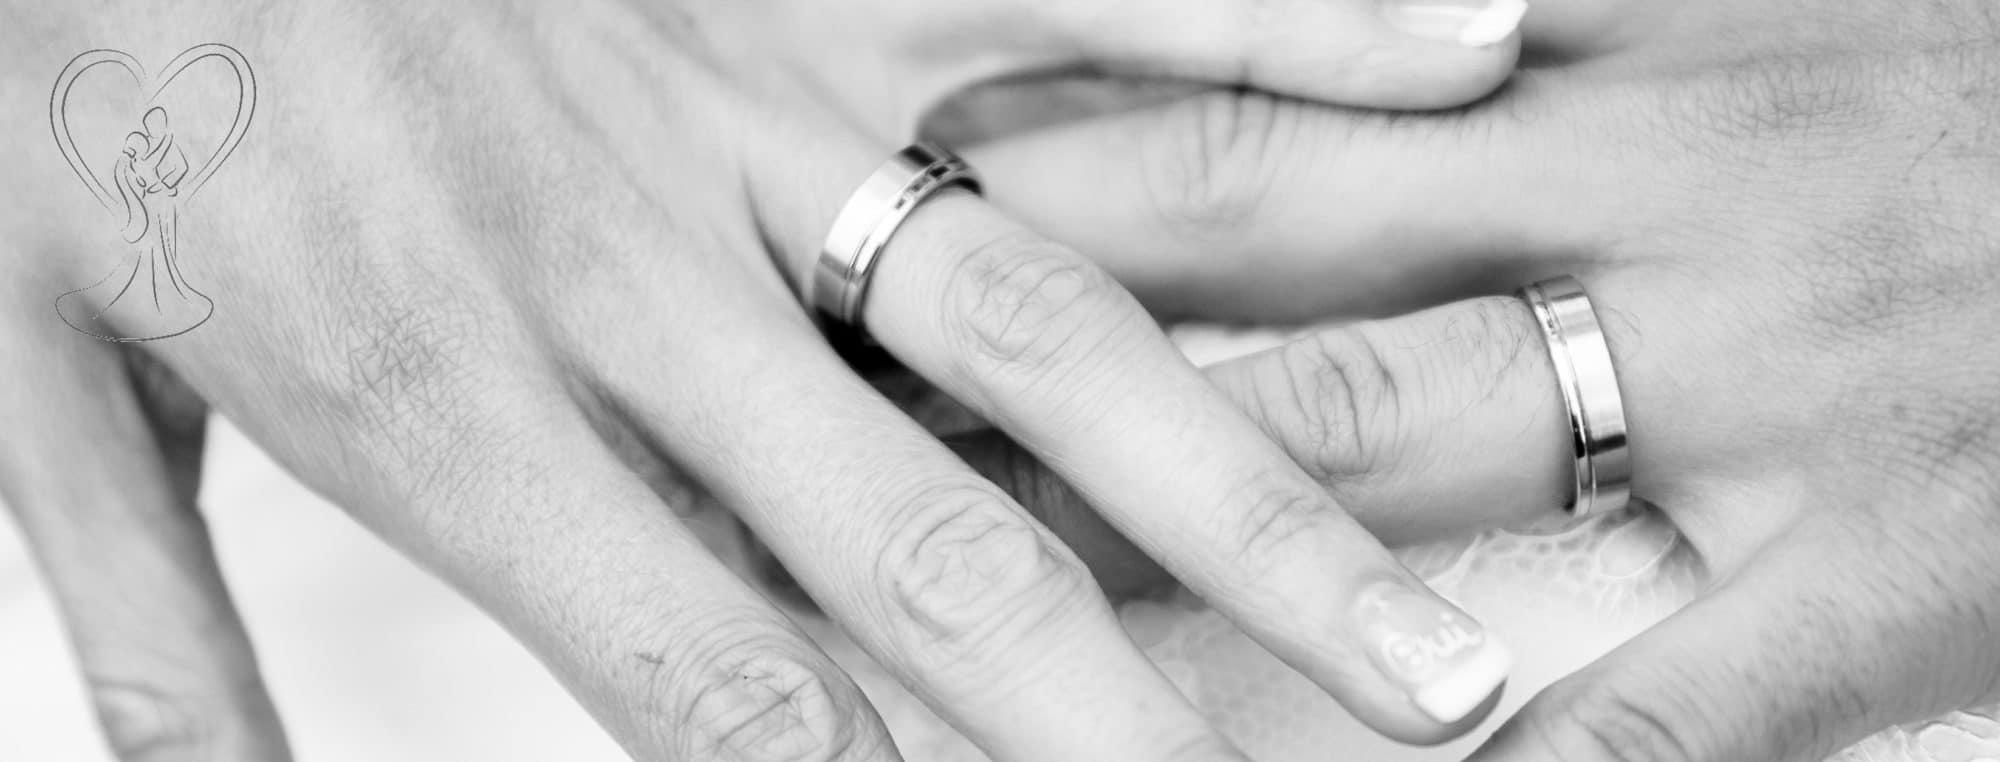 causons mariage